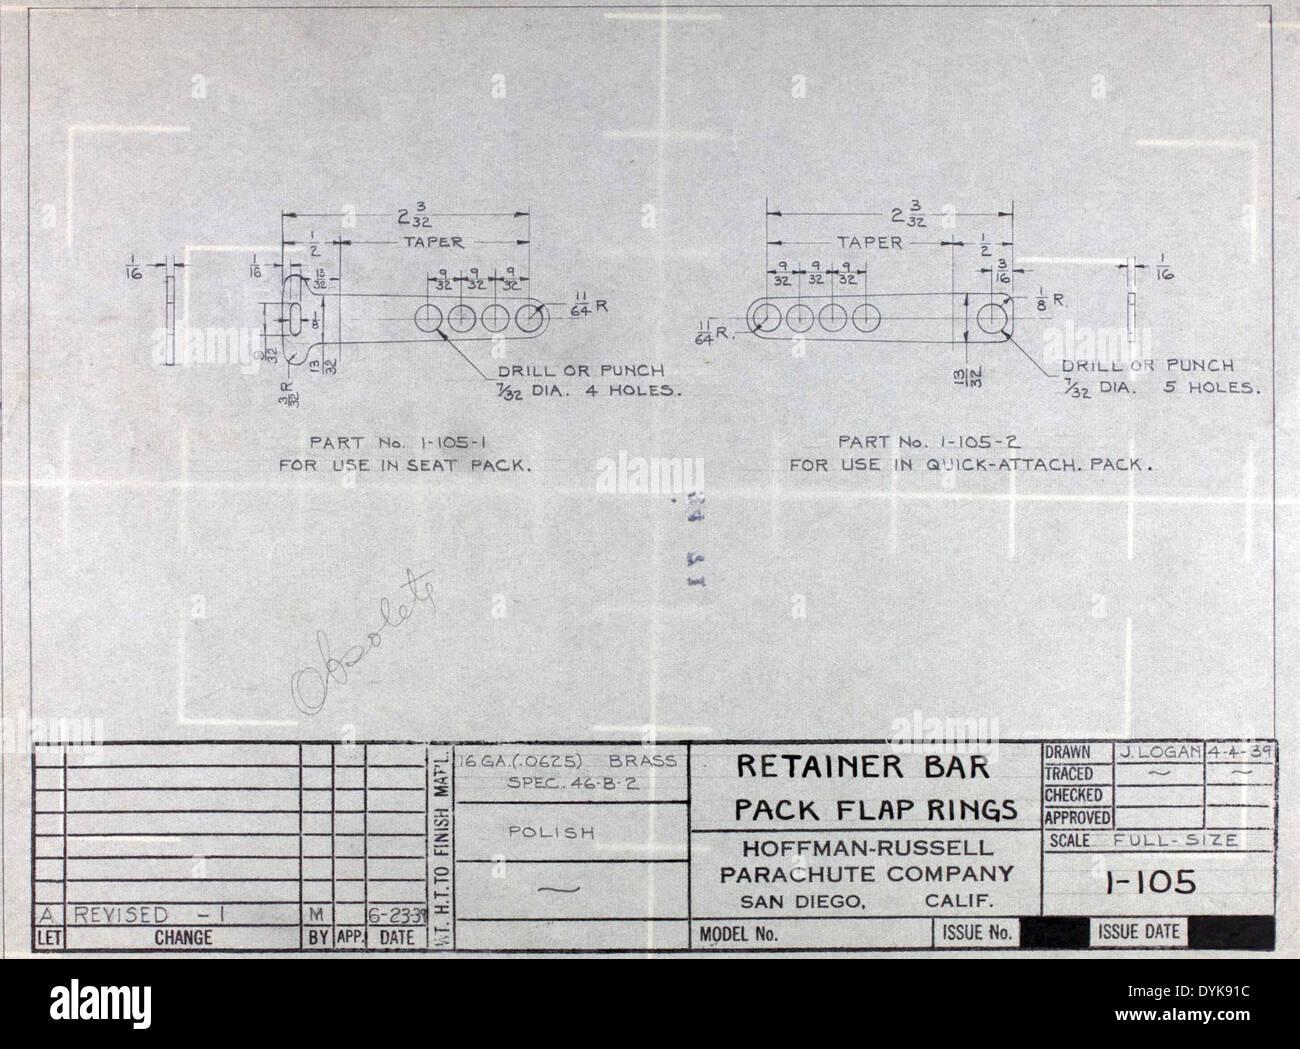 Bauplan: Halter Bar Pack Klappe Ringe Stockfoto, Bild: 68651000 - Alamy